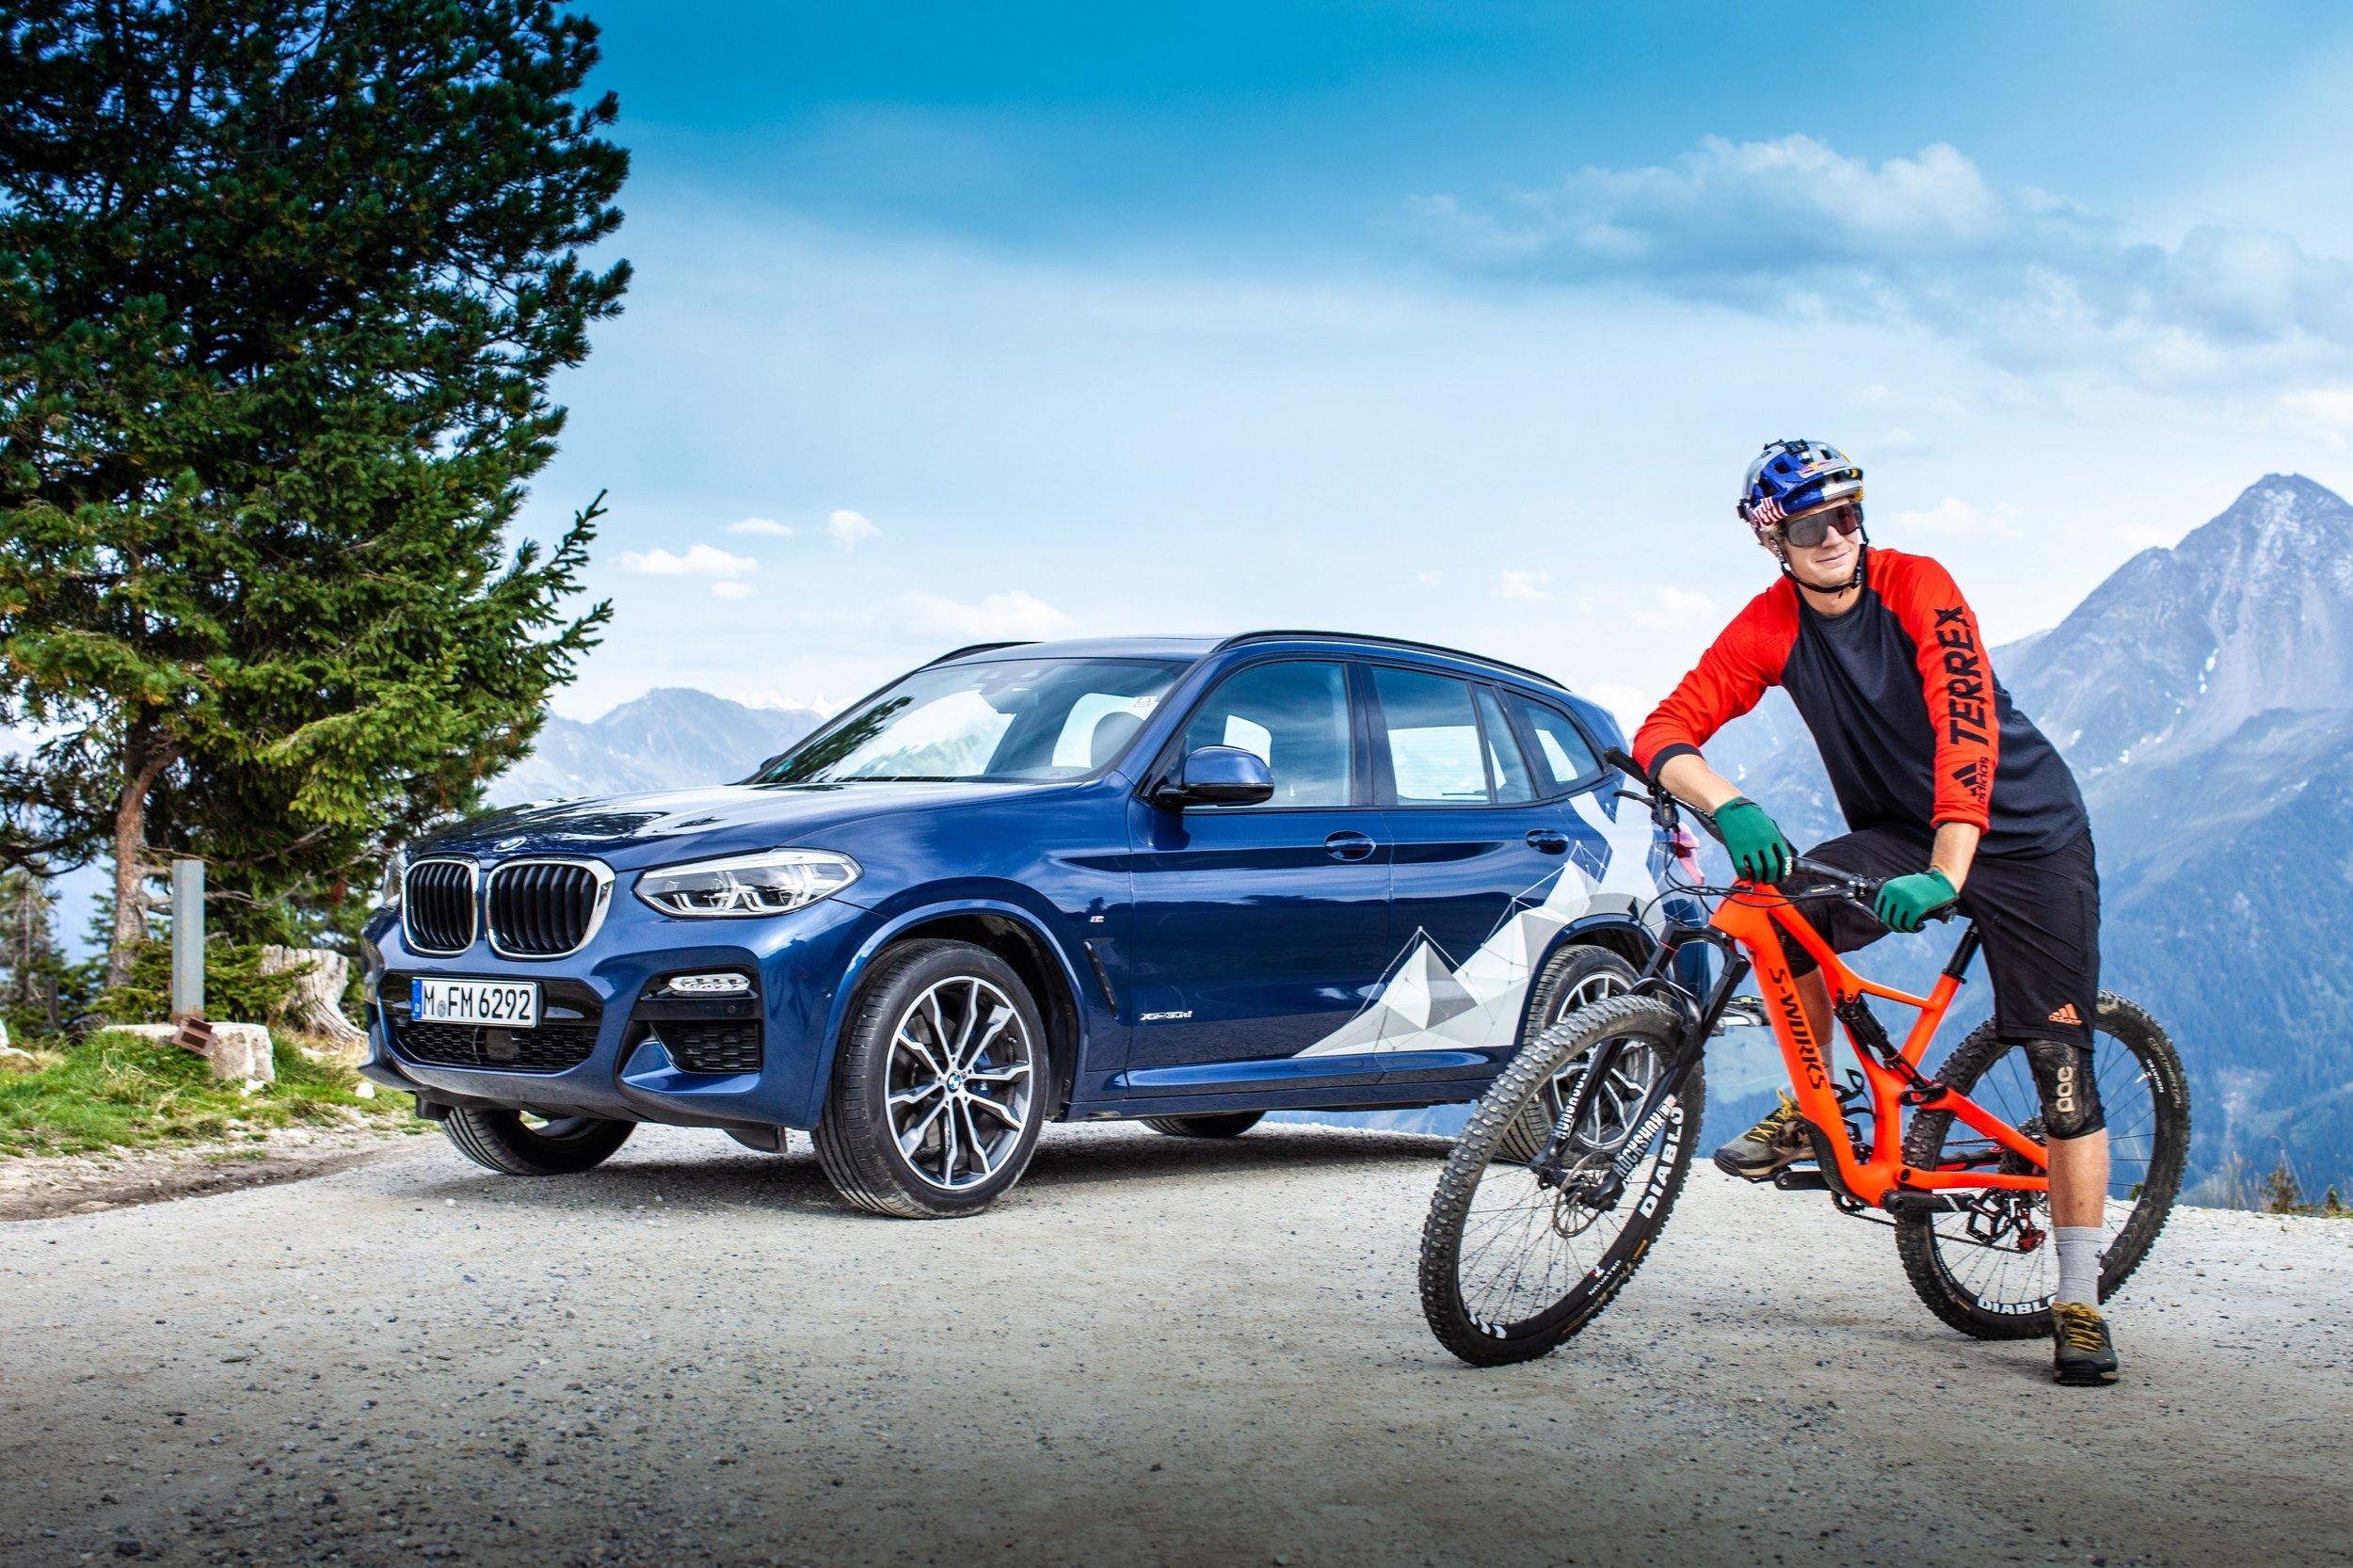 BMW_Mountain_Zillertal_2018_Day3-5759.jpg